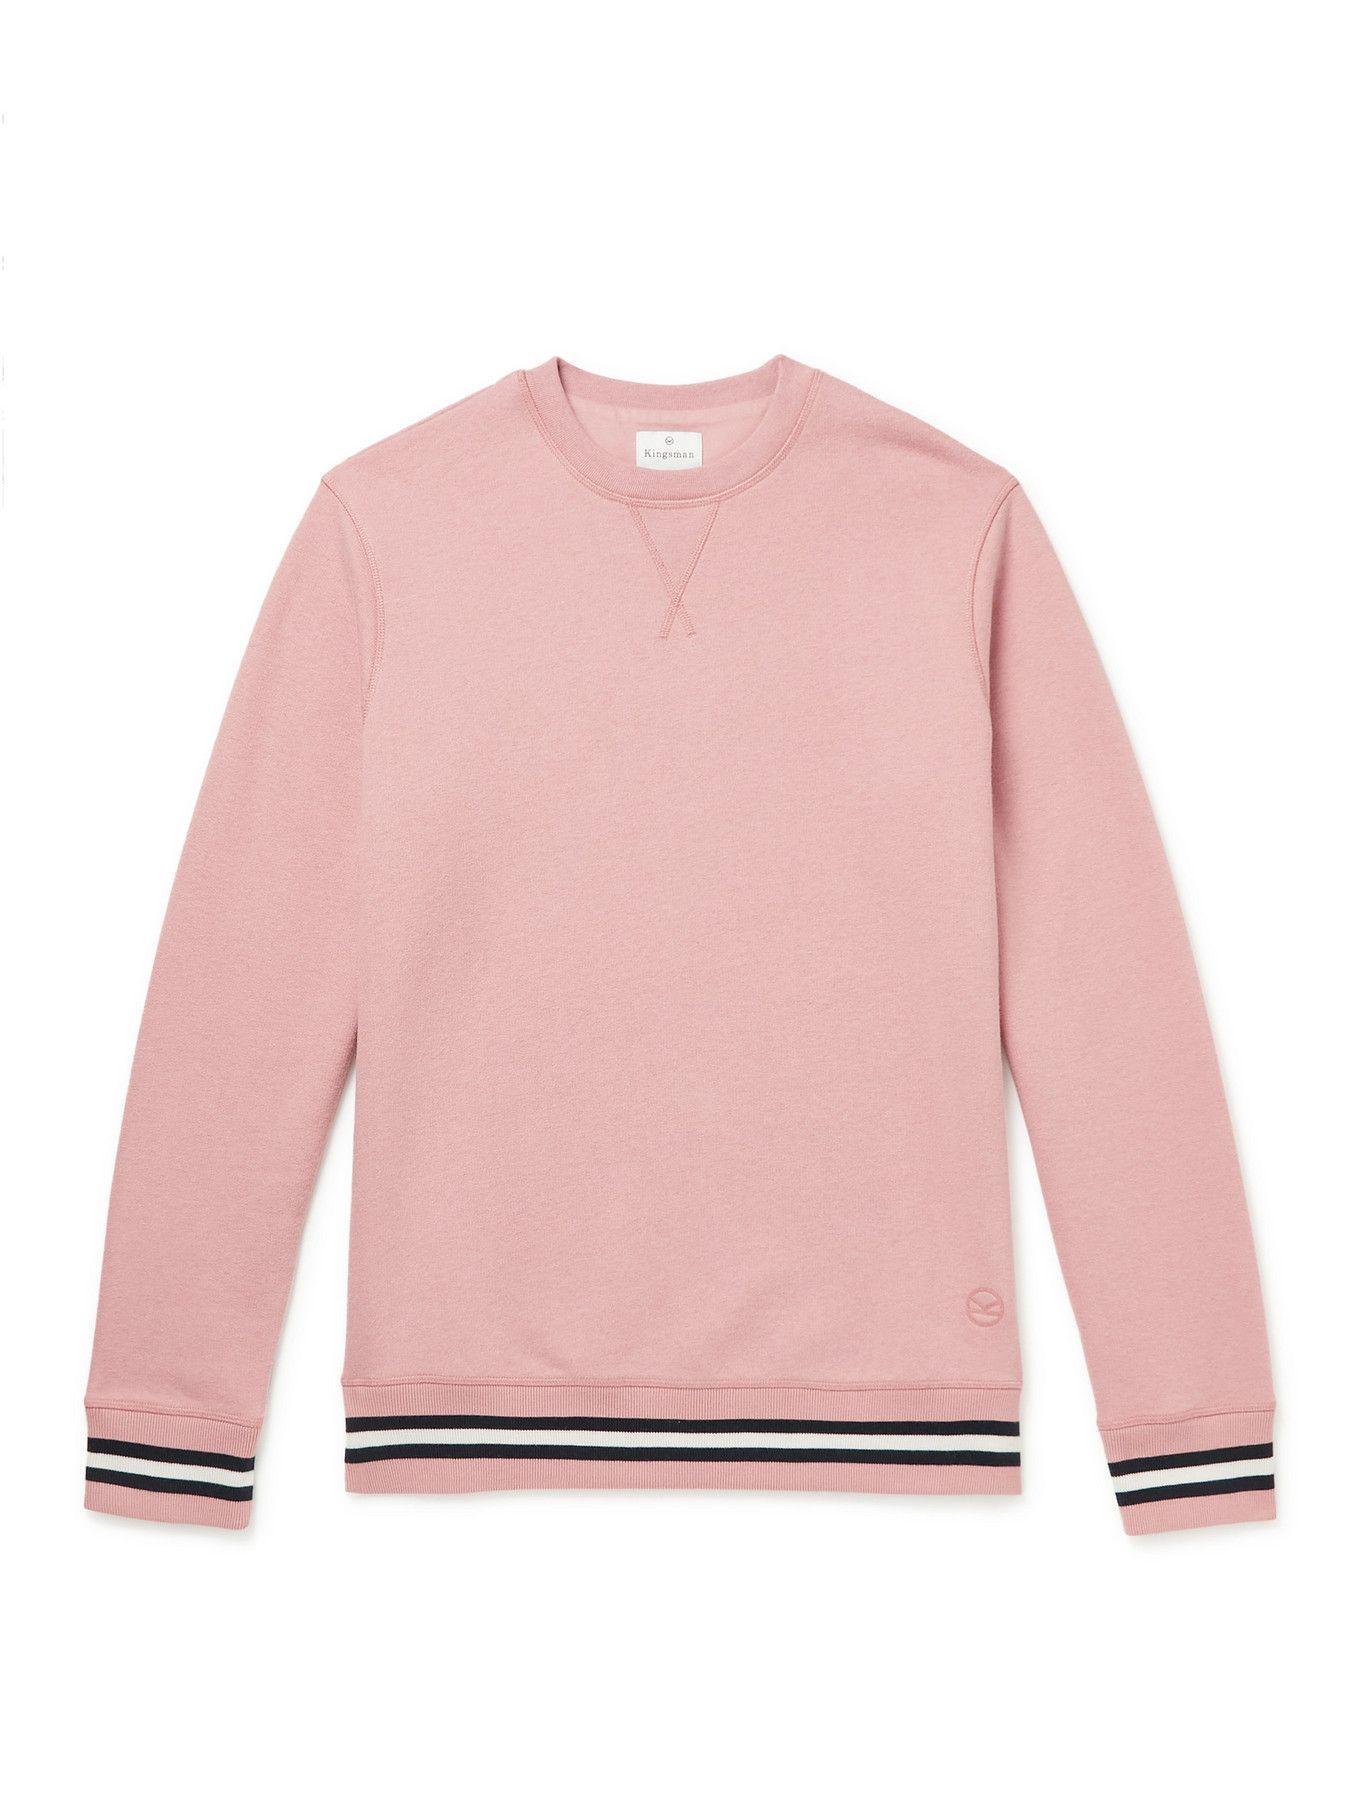 Photo: Kingsman - Striped Cotton and Cashmere-Blend Jersey Sweatshirt - Pink